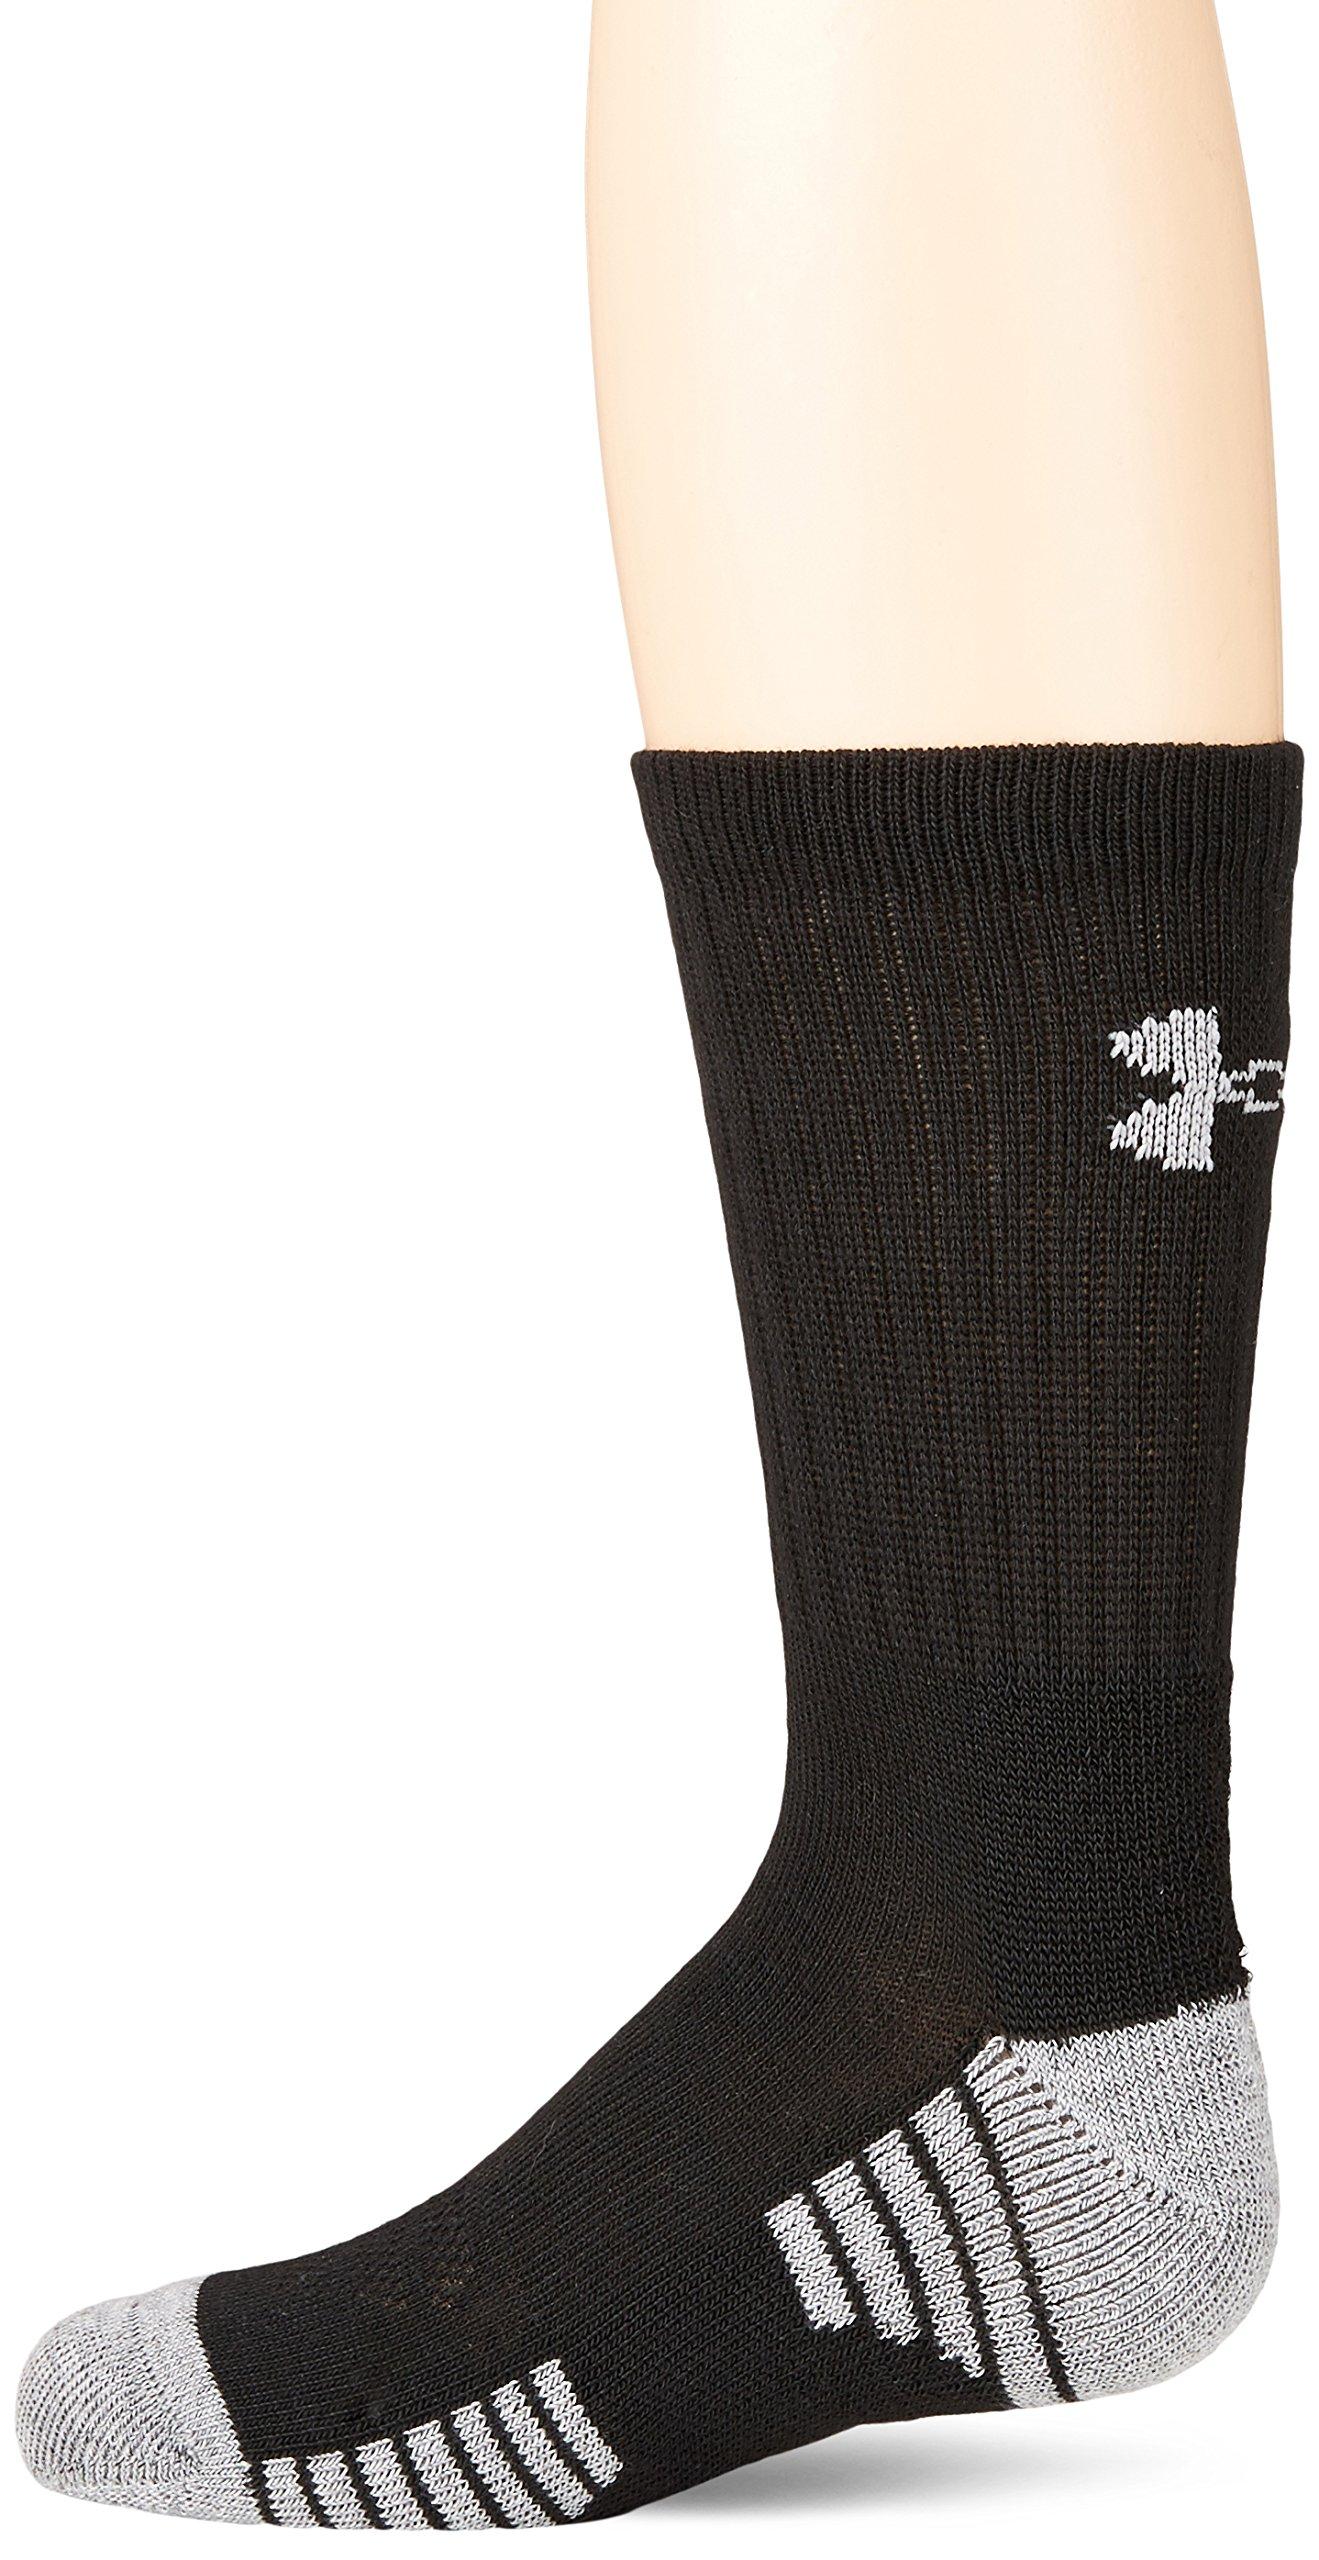 Under Armour Boys Heatgear Tech Crew Socks, Black, Youth Medium, 3- Pairs by Under Armour